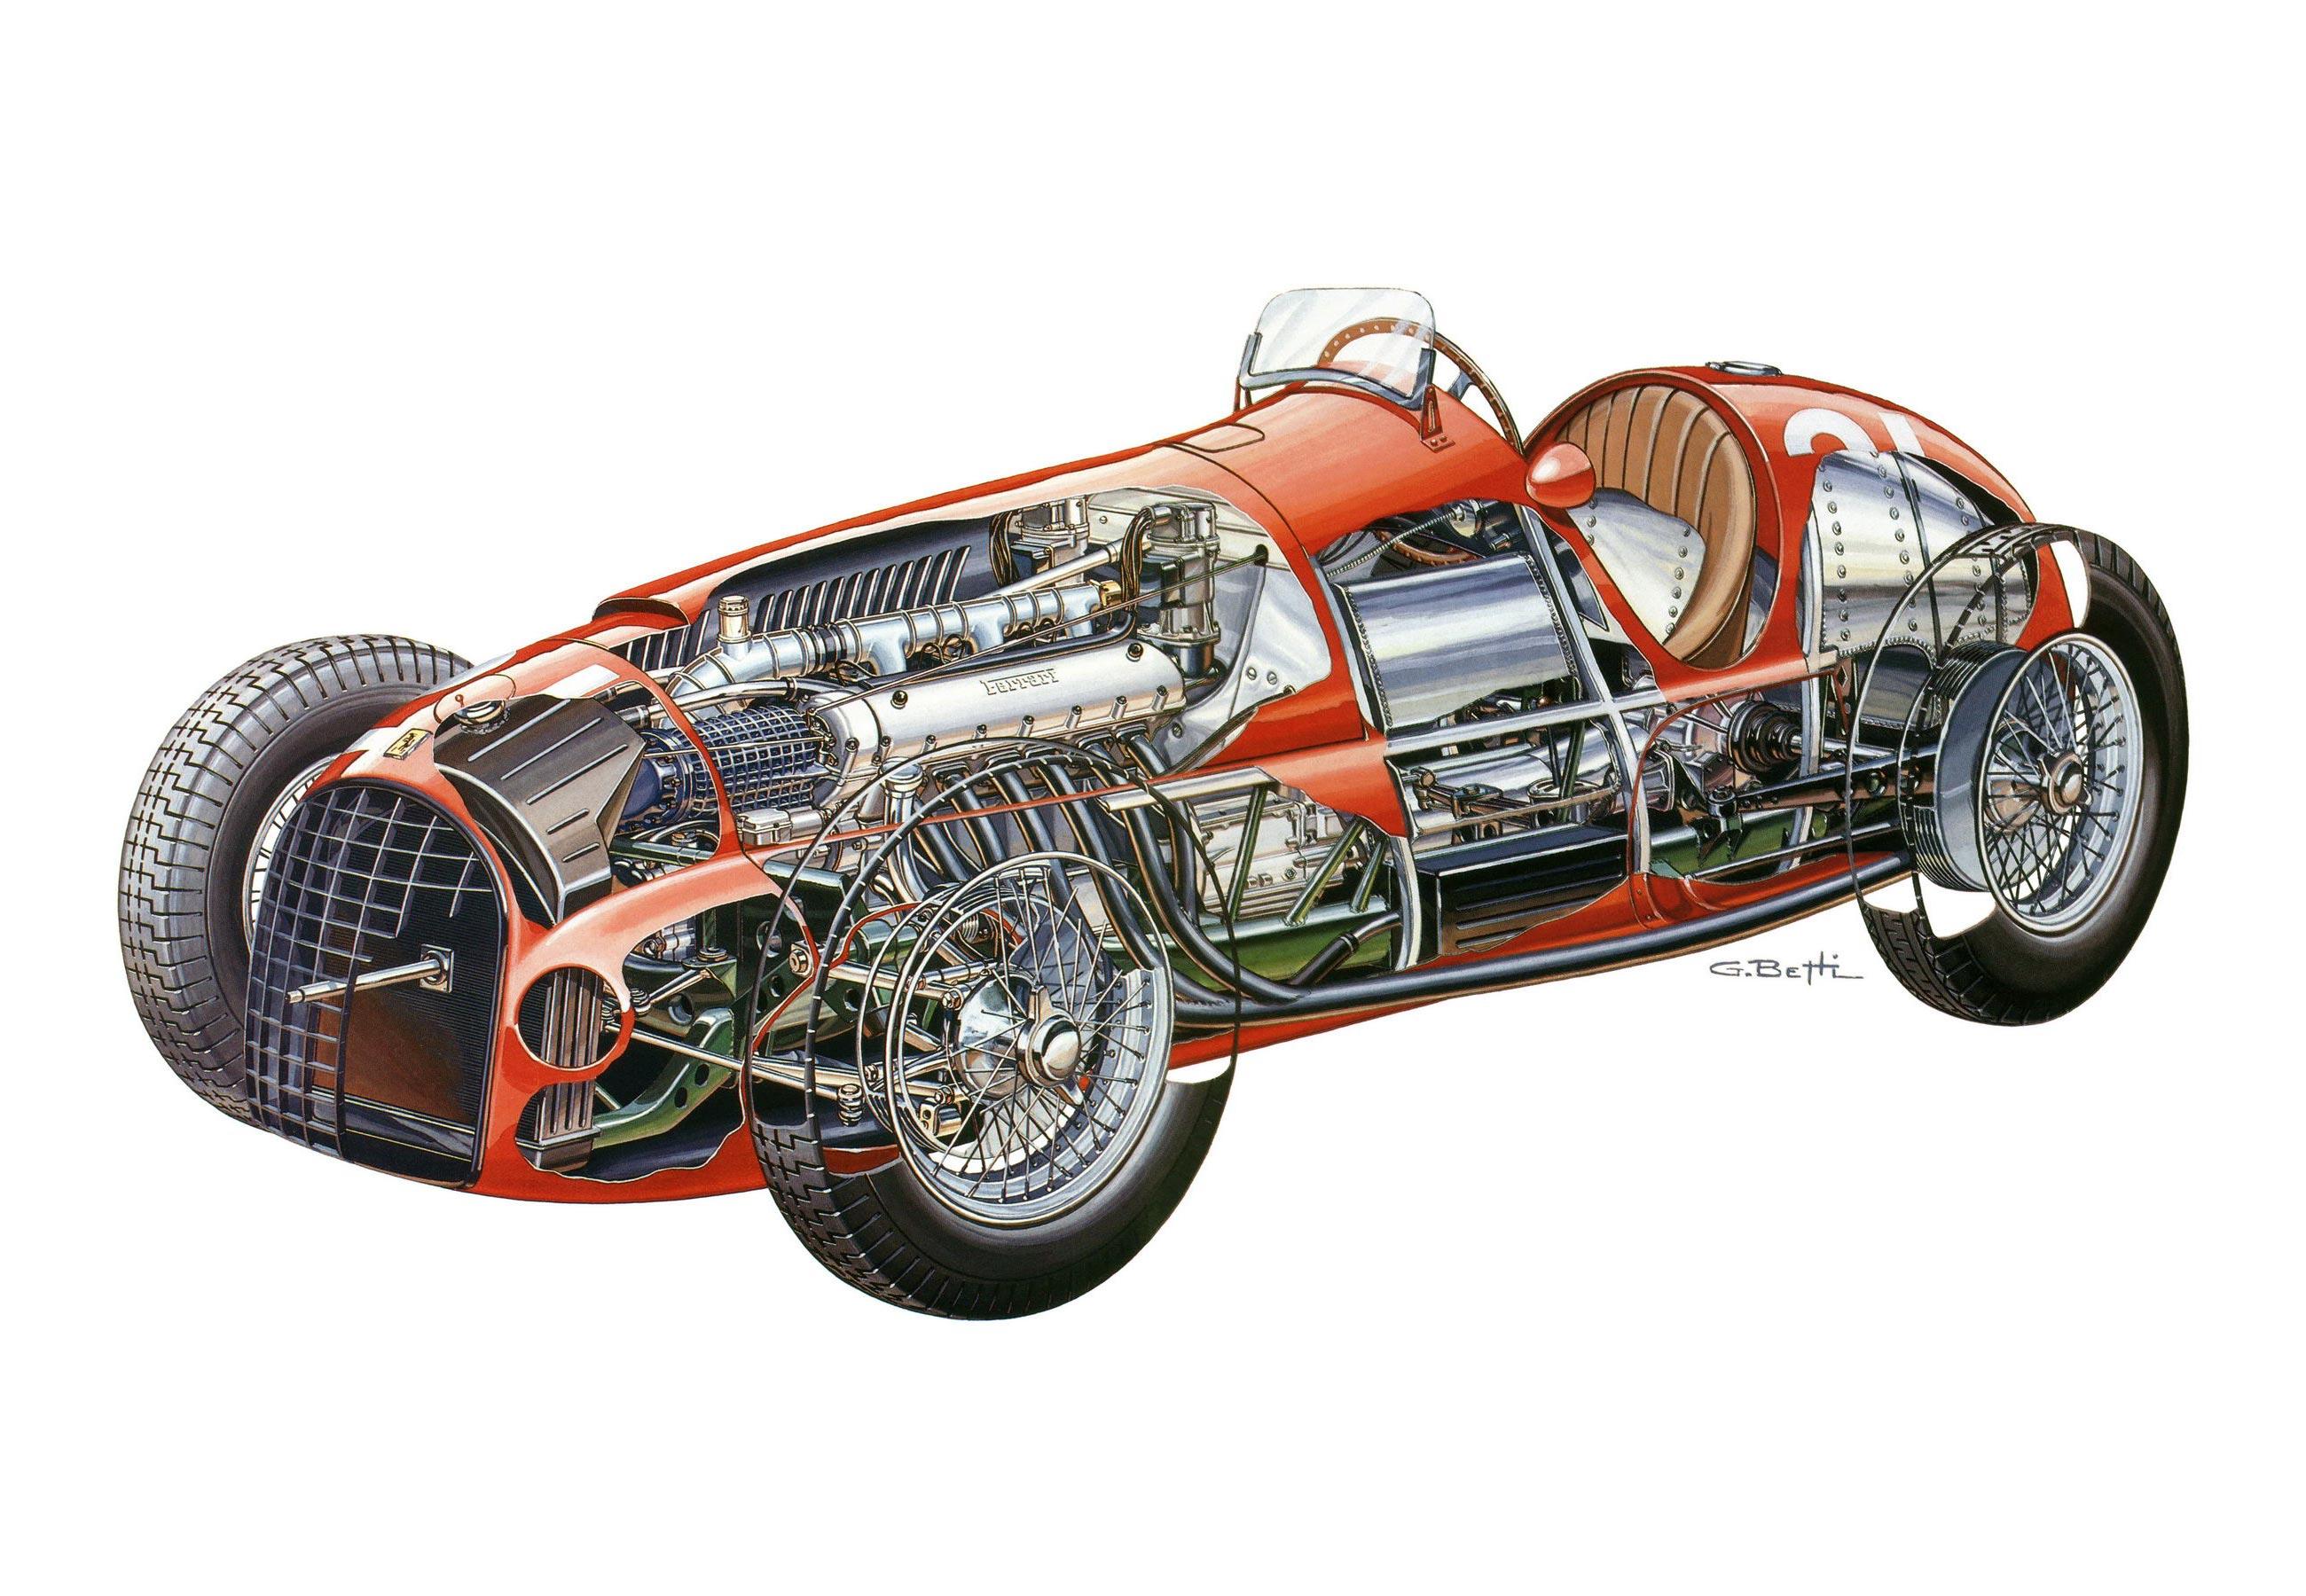 Ferrari 125 F1 cutaway drawing